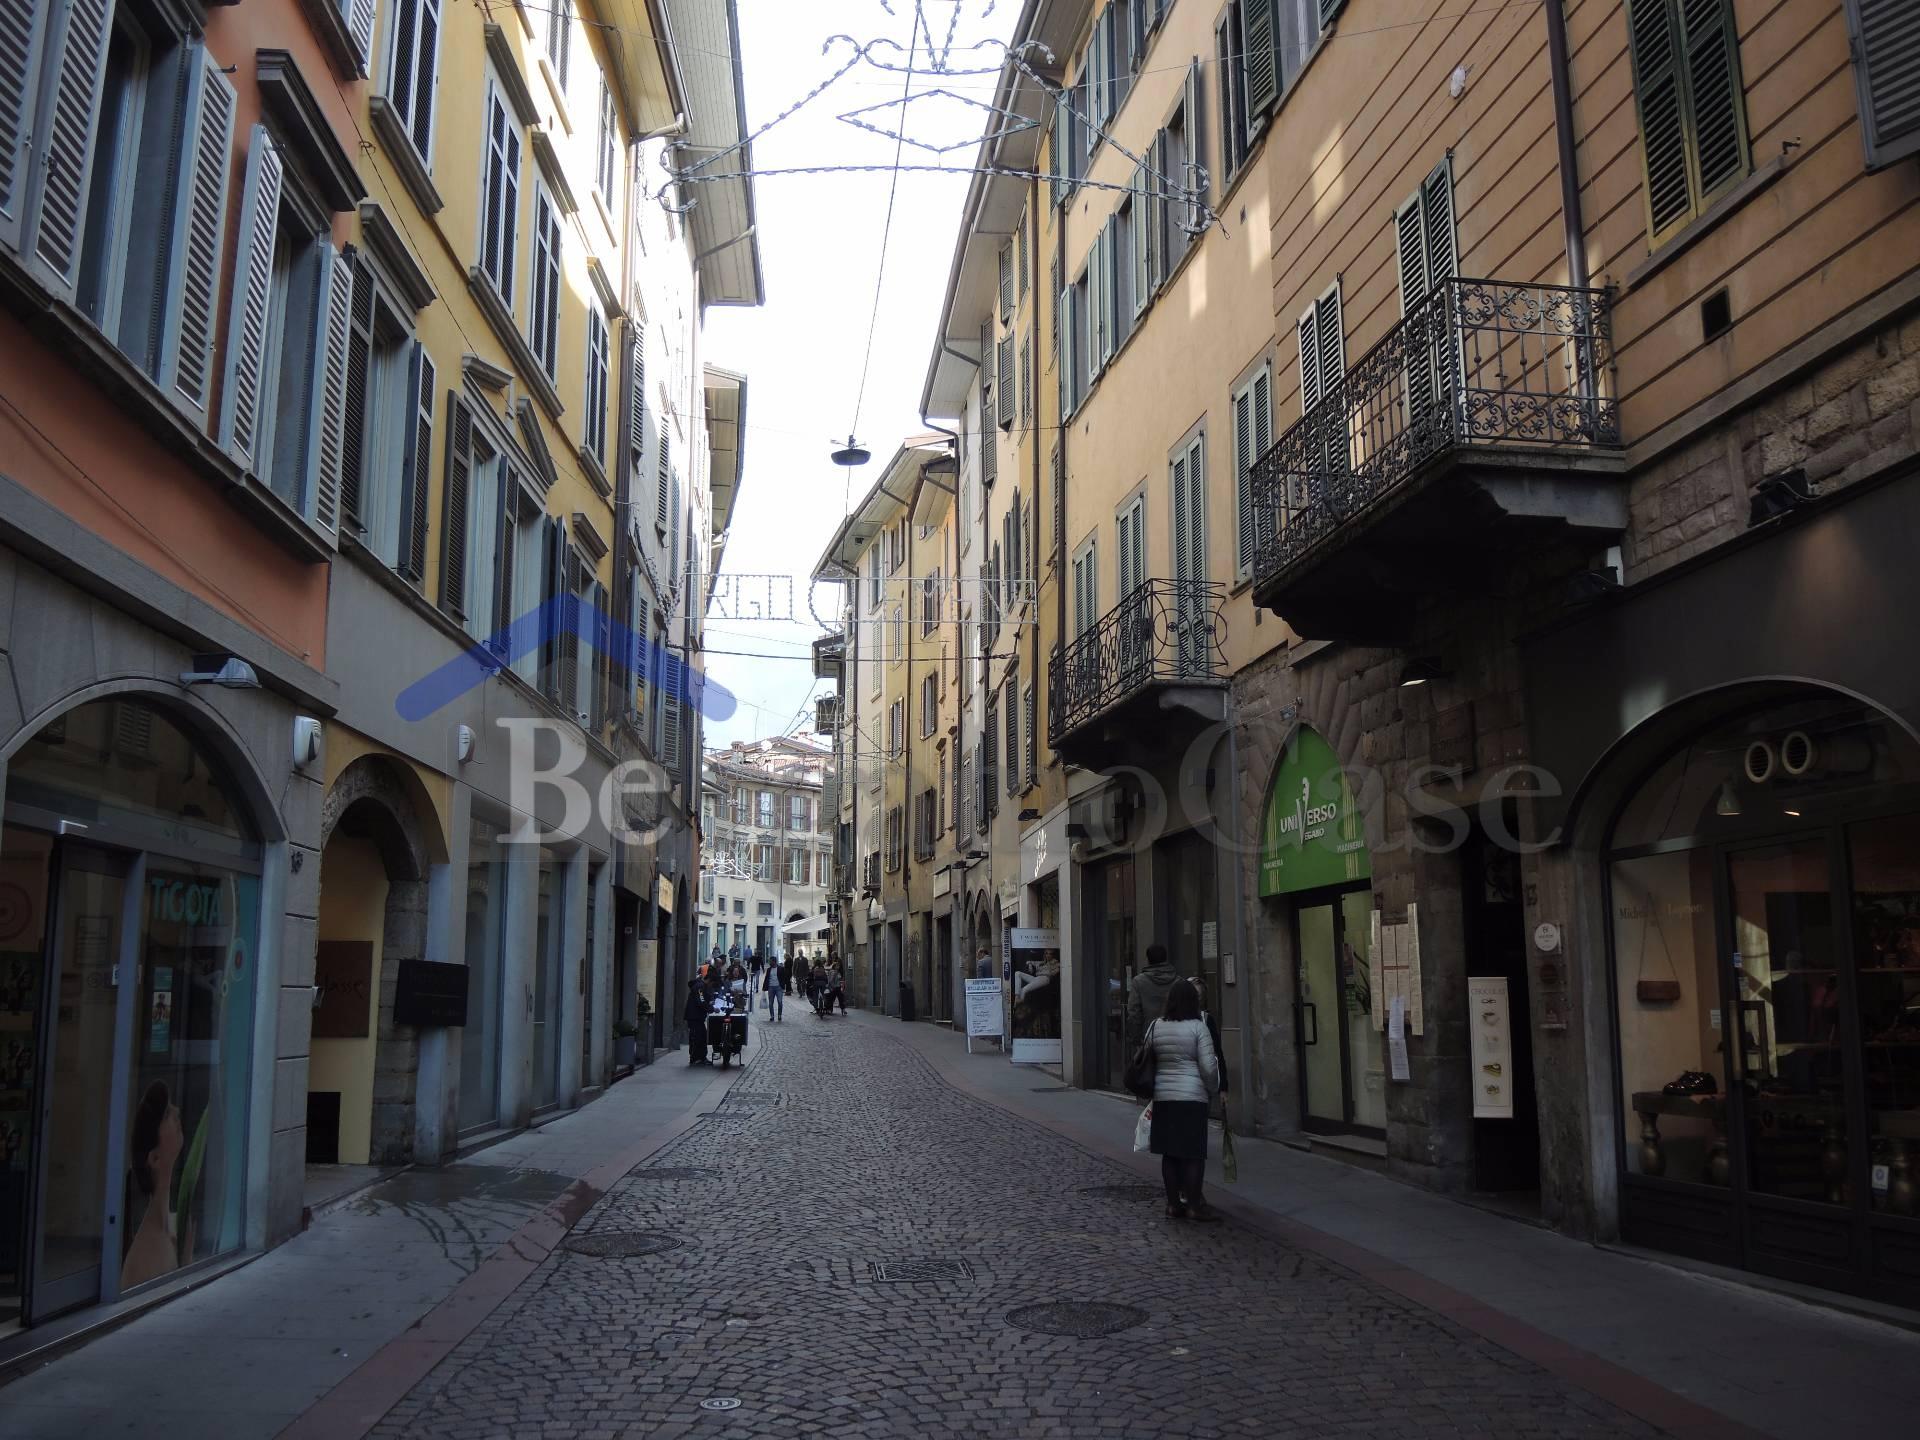 Bilocale Bergamo Via Sant'alessandro 10